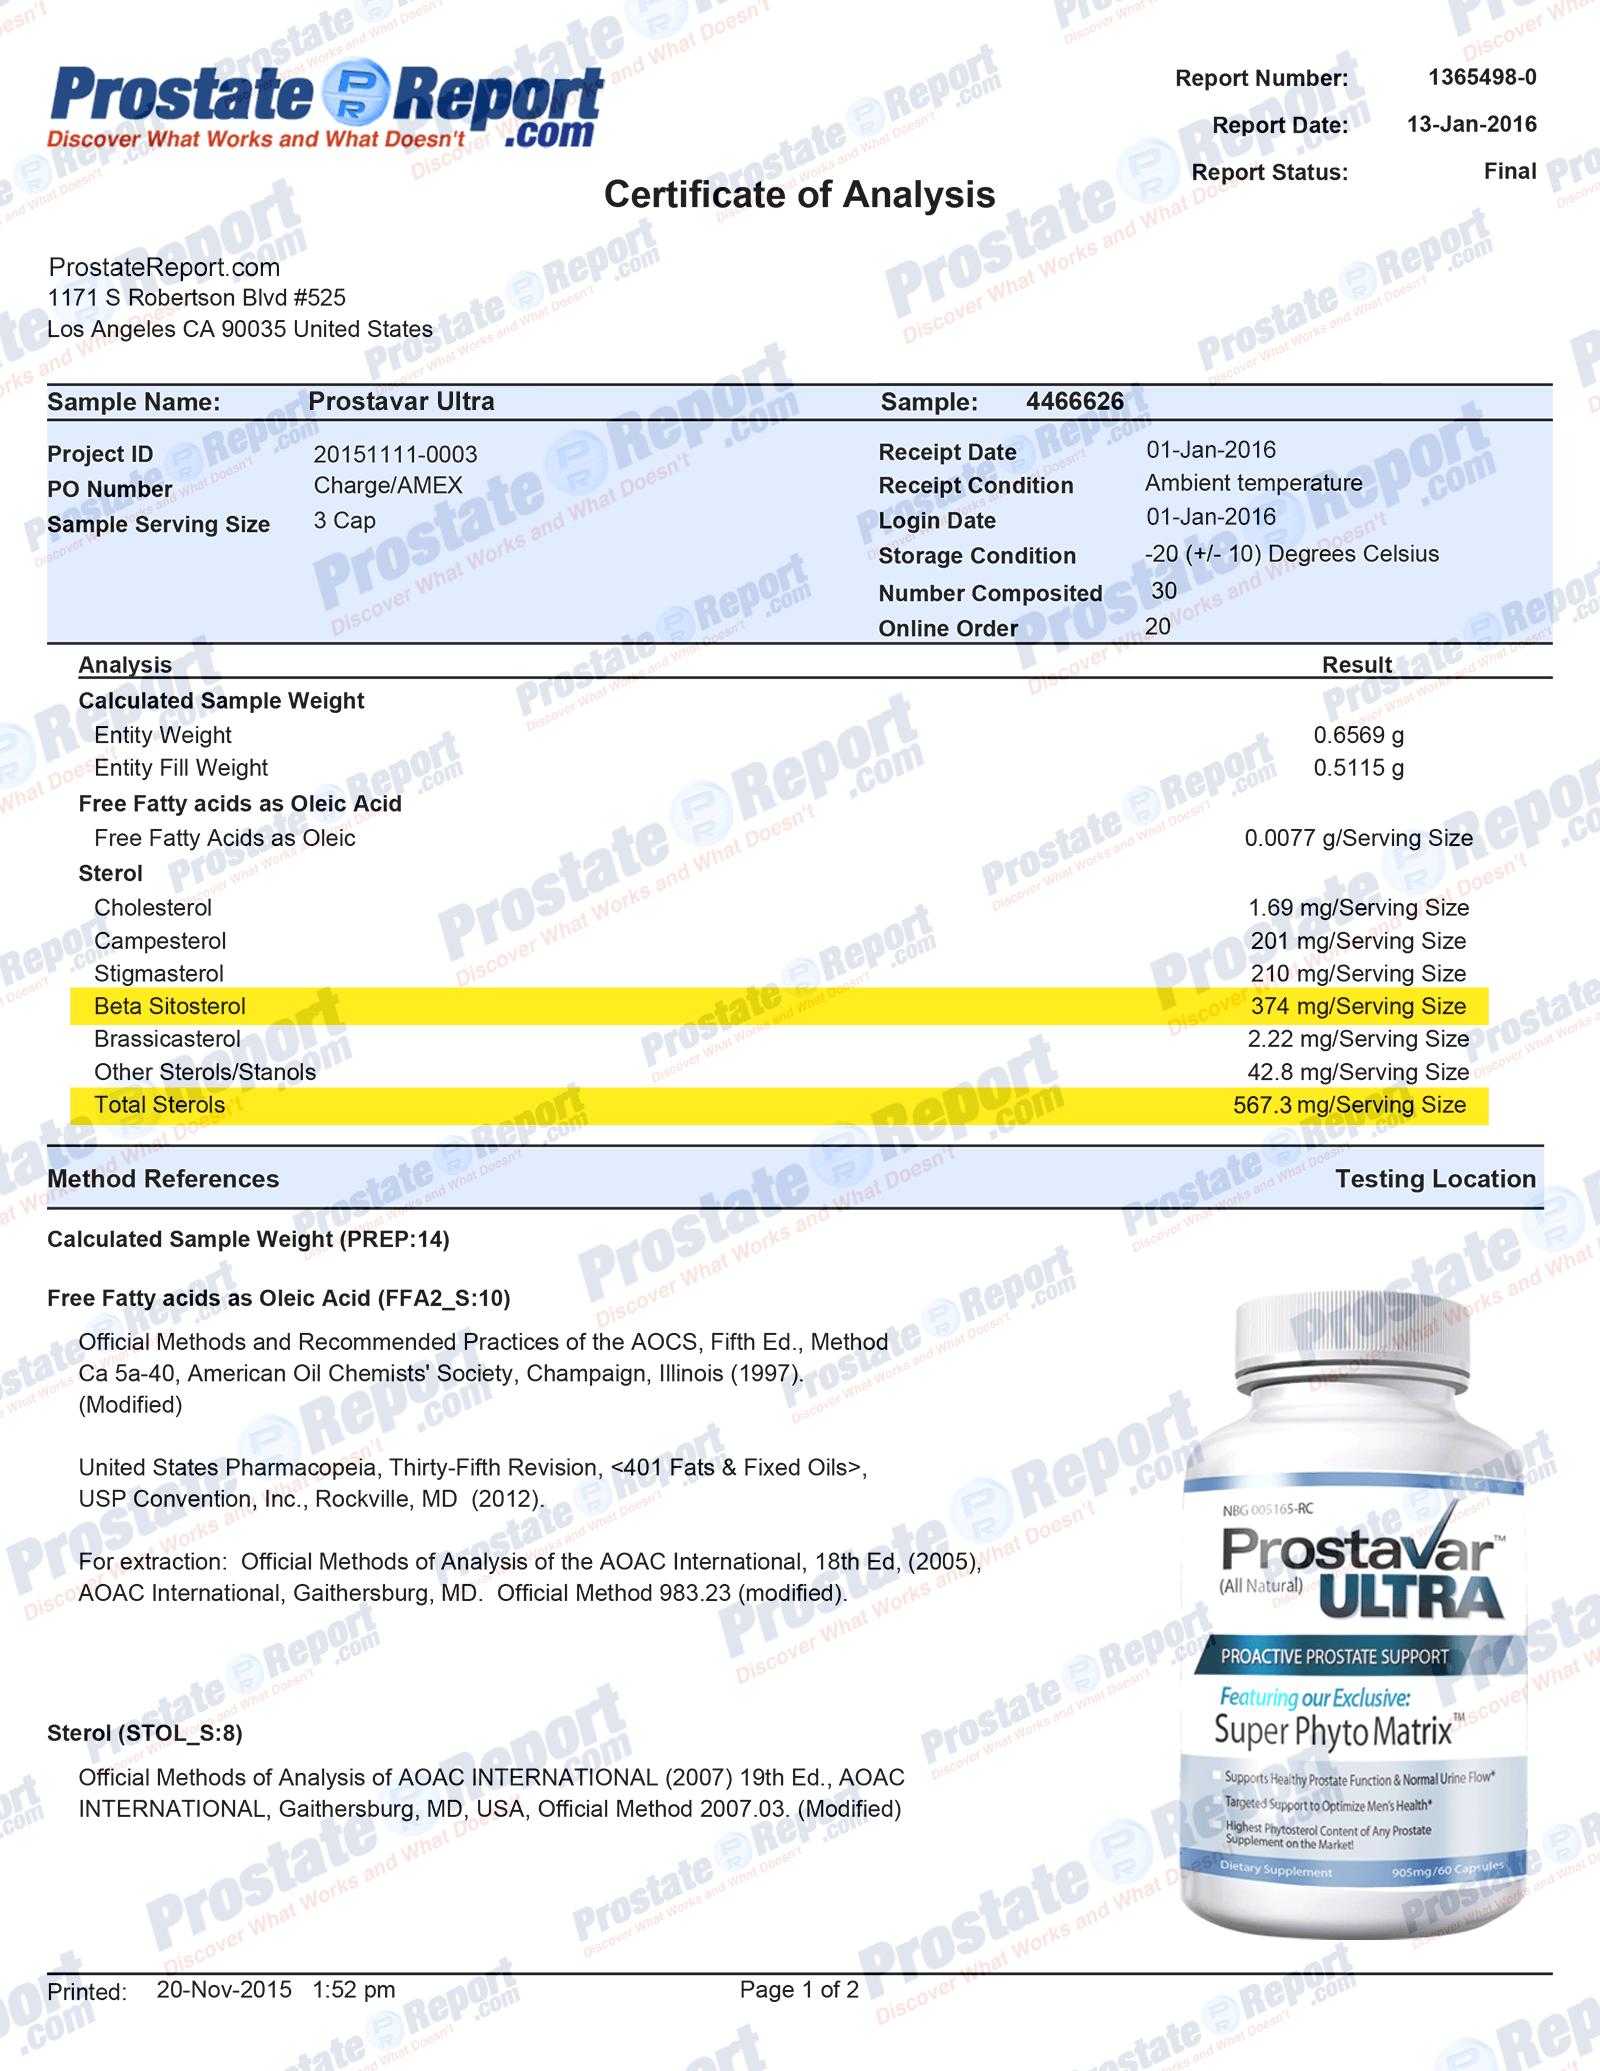 Prostavar Ultra lab report